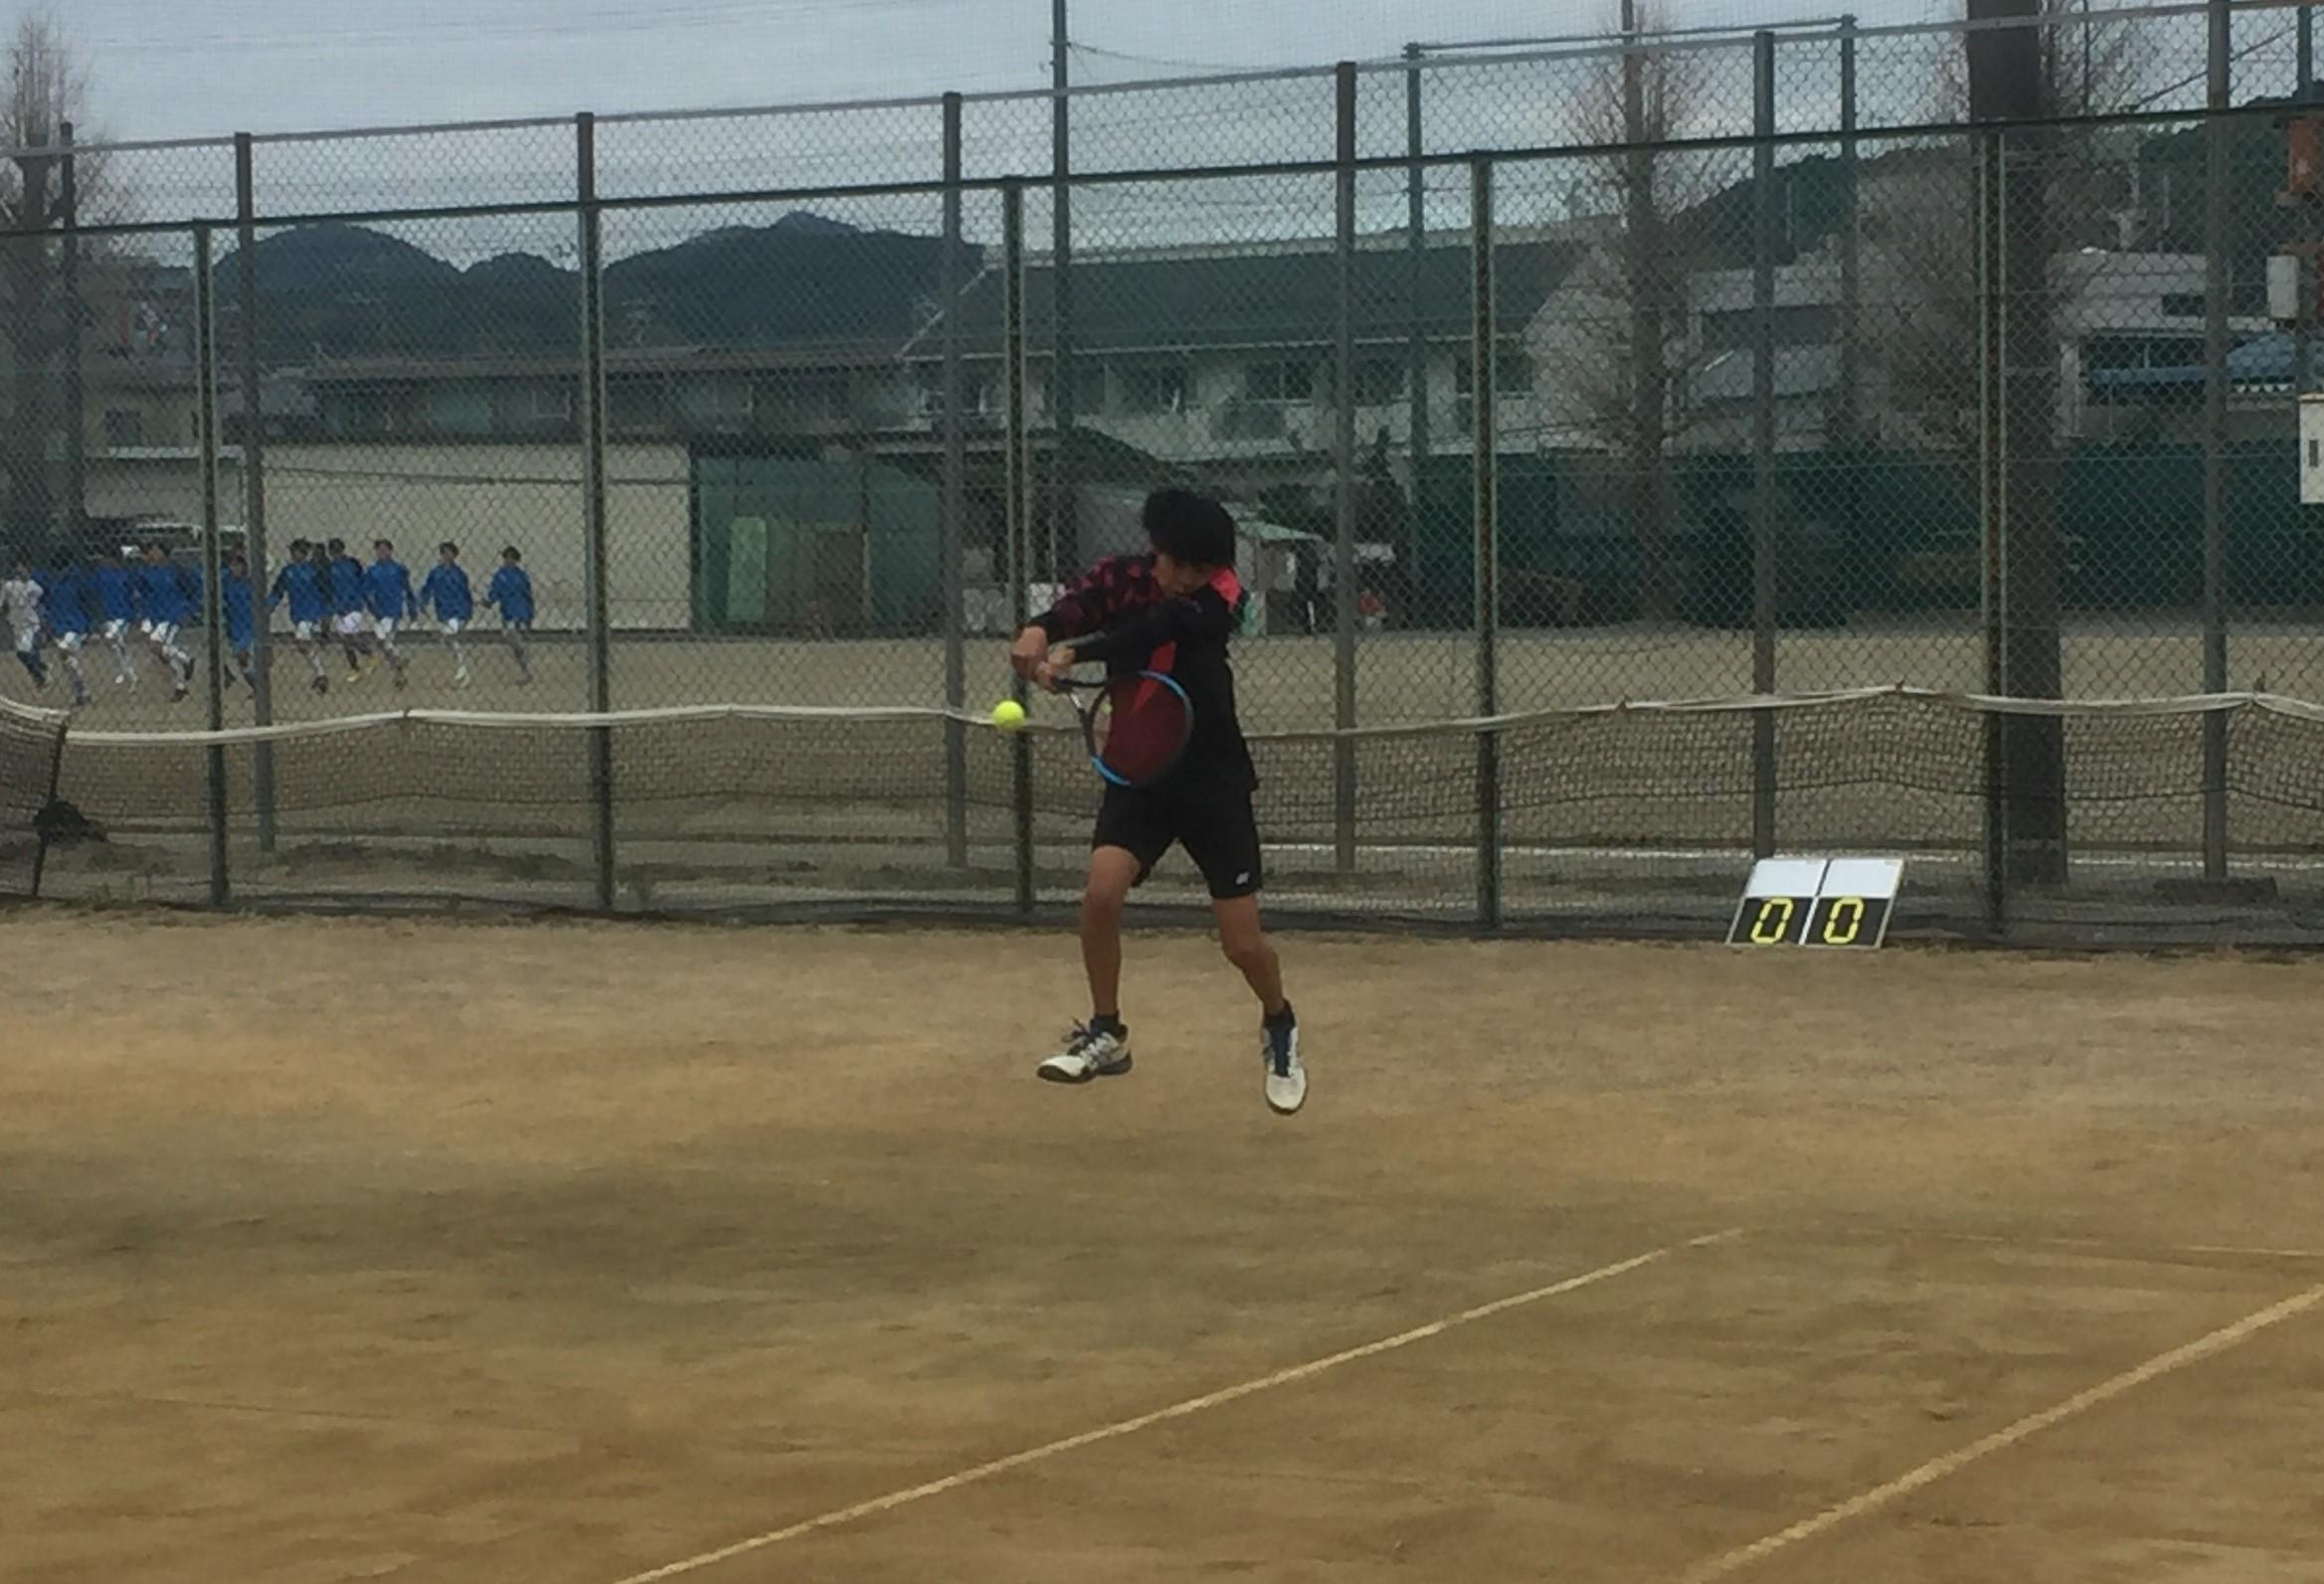 志榛地区高等学校対抗テニス大会で好成績!